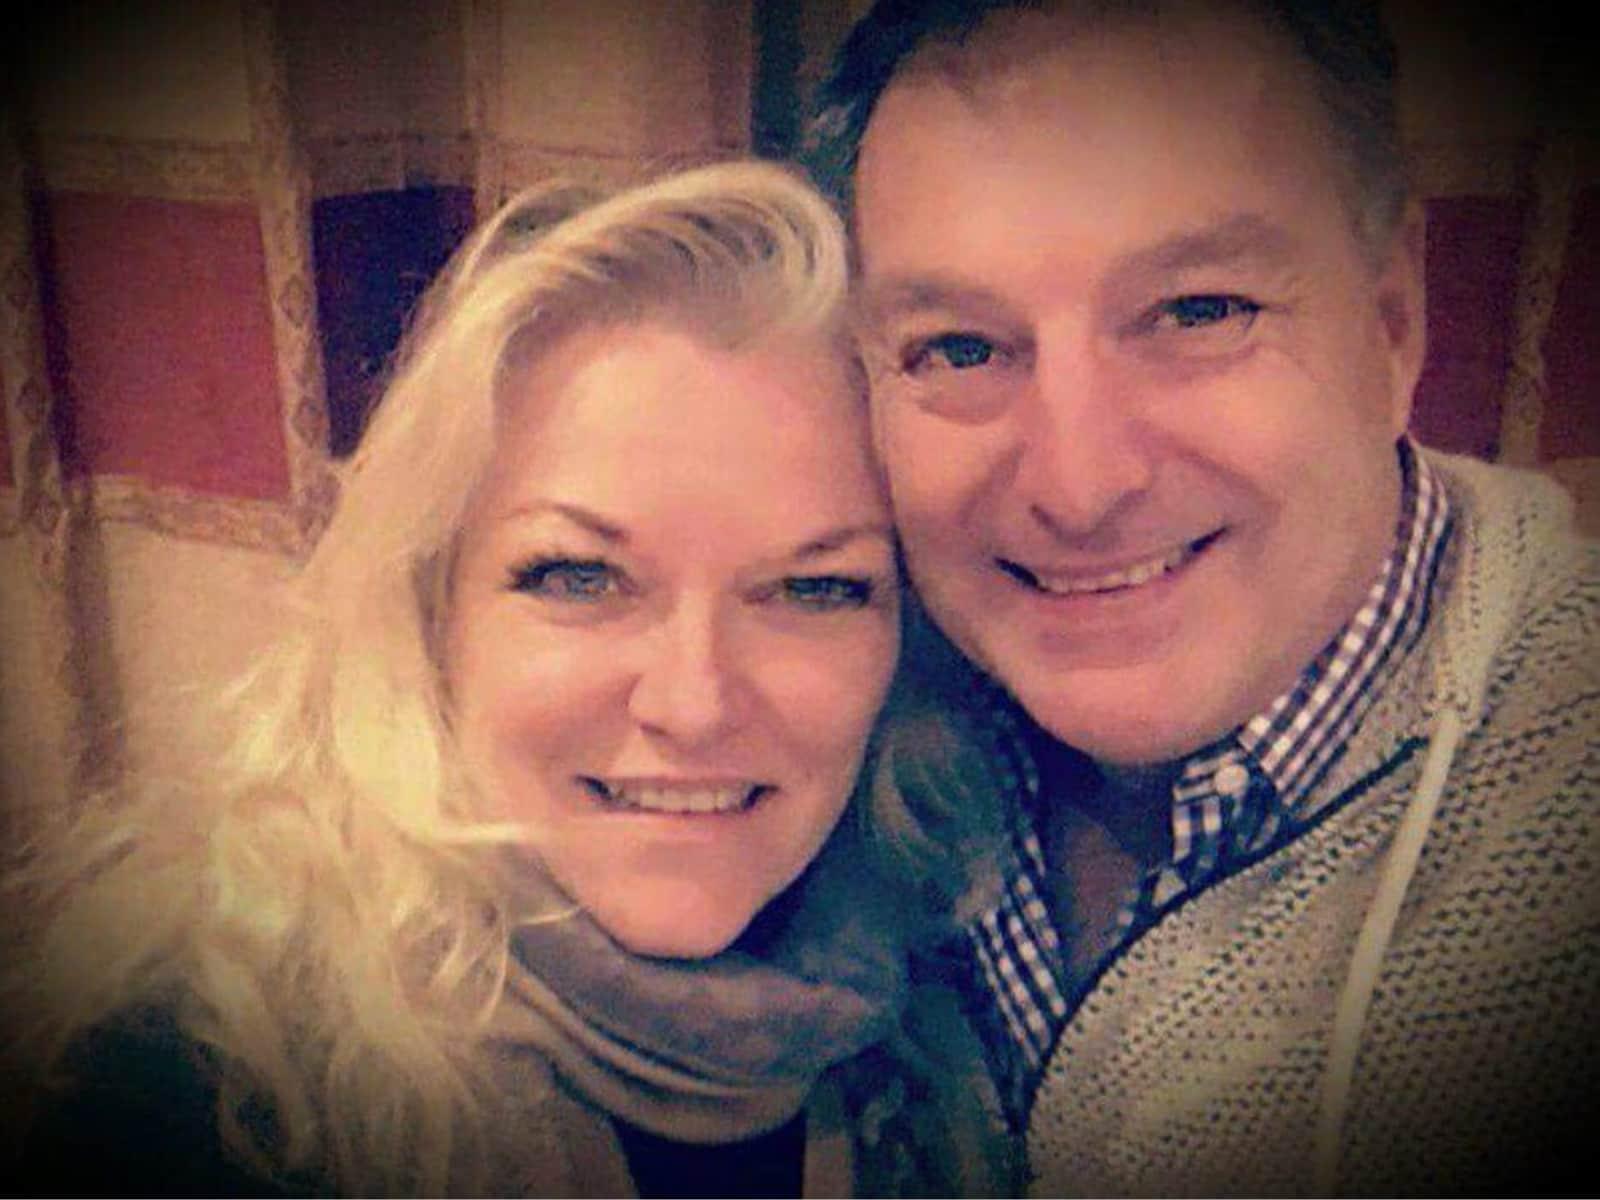 Heather & Steve from City of London, United Kingdom